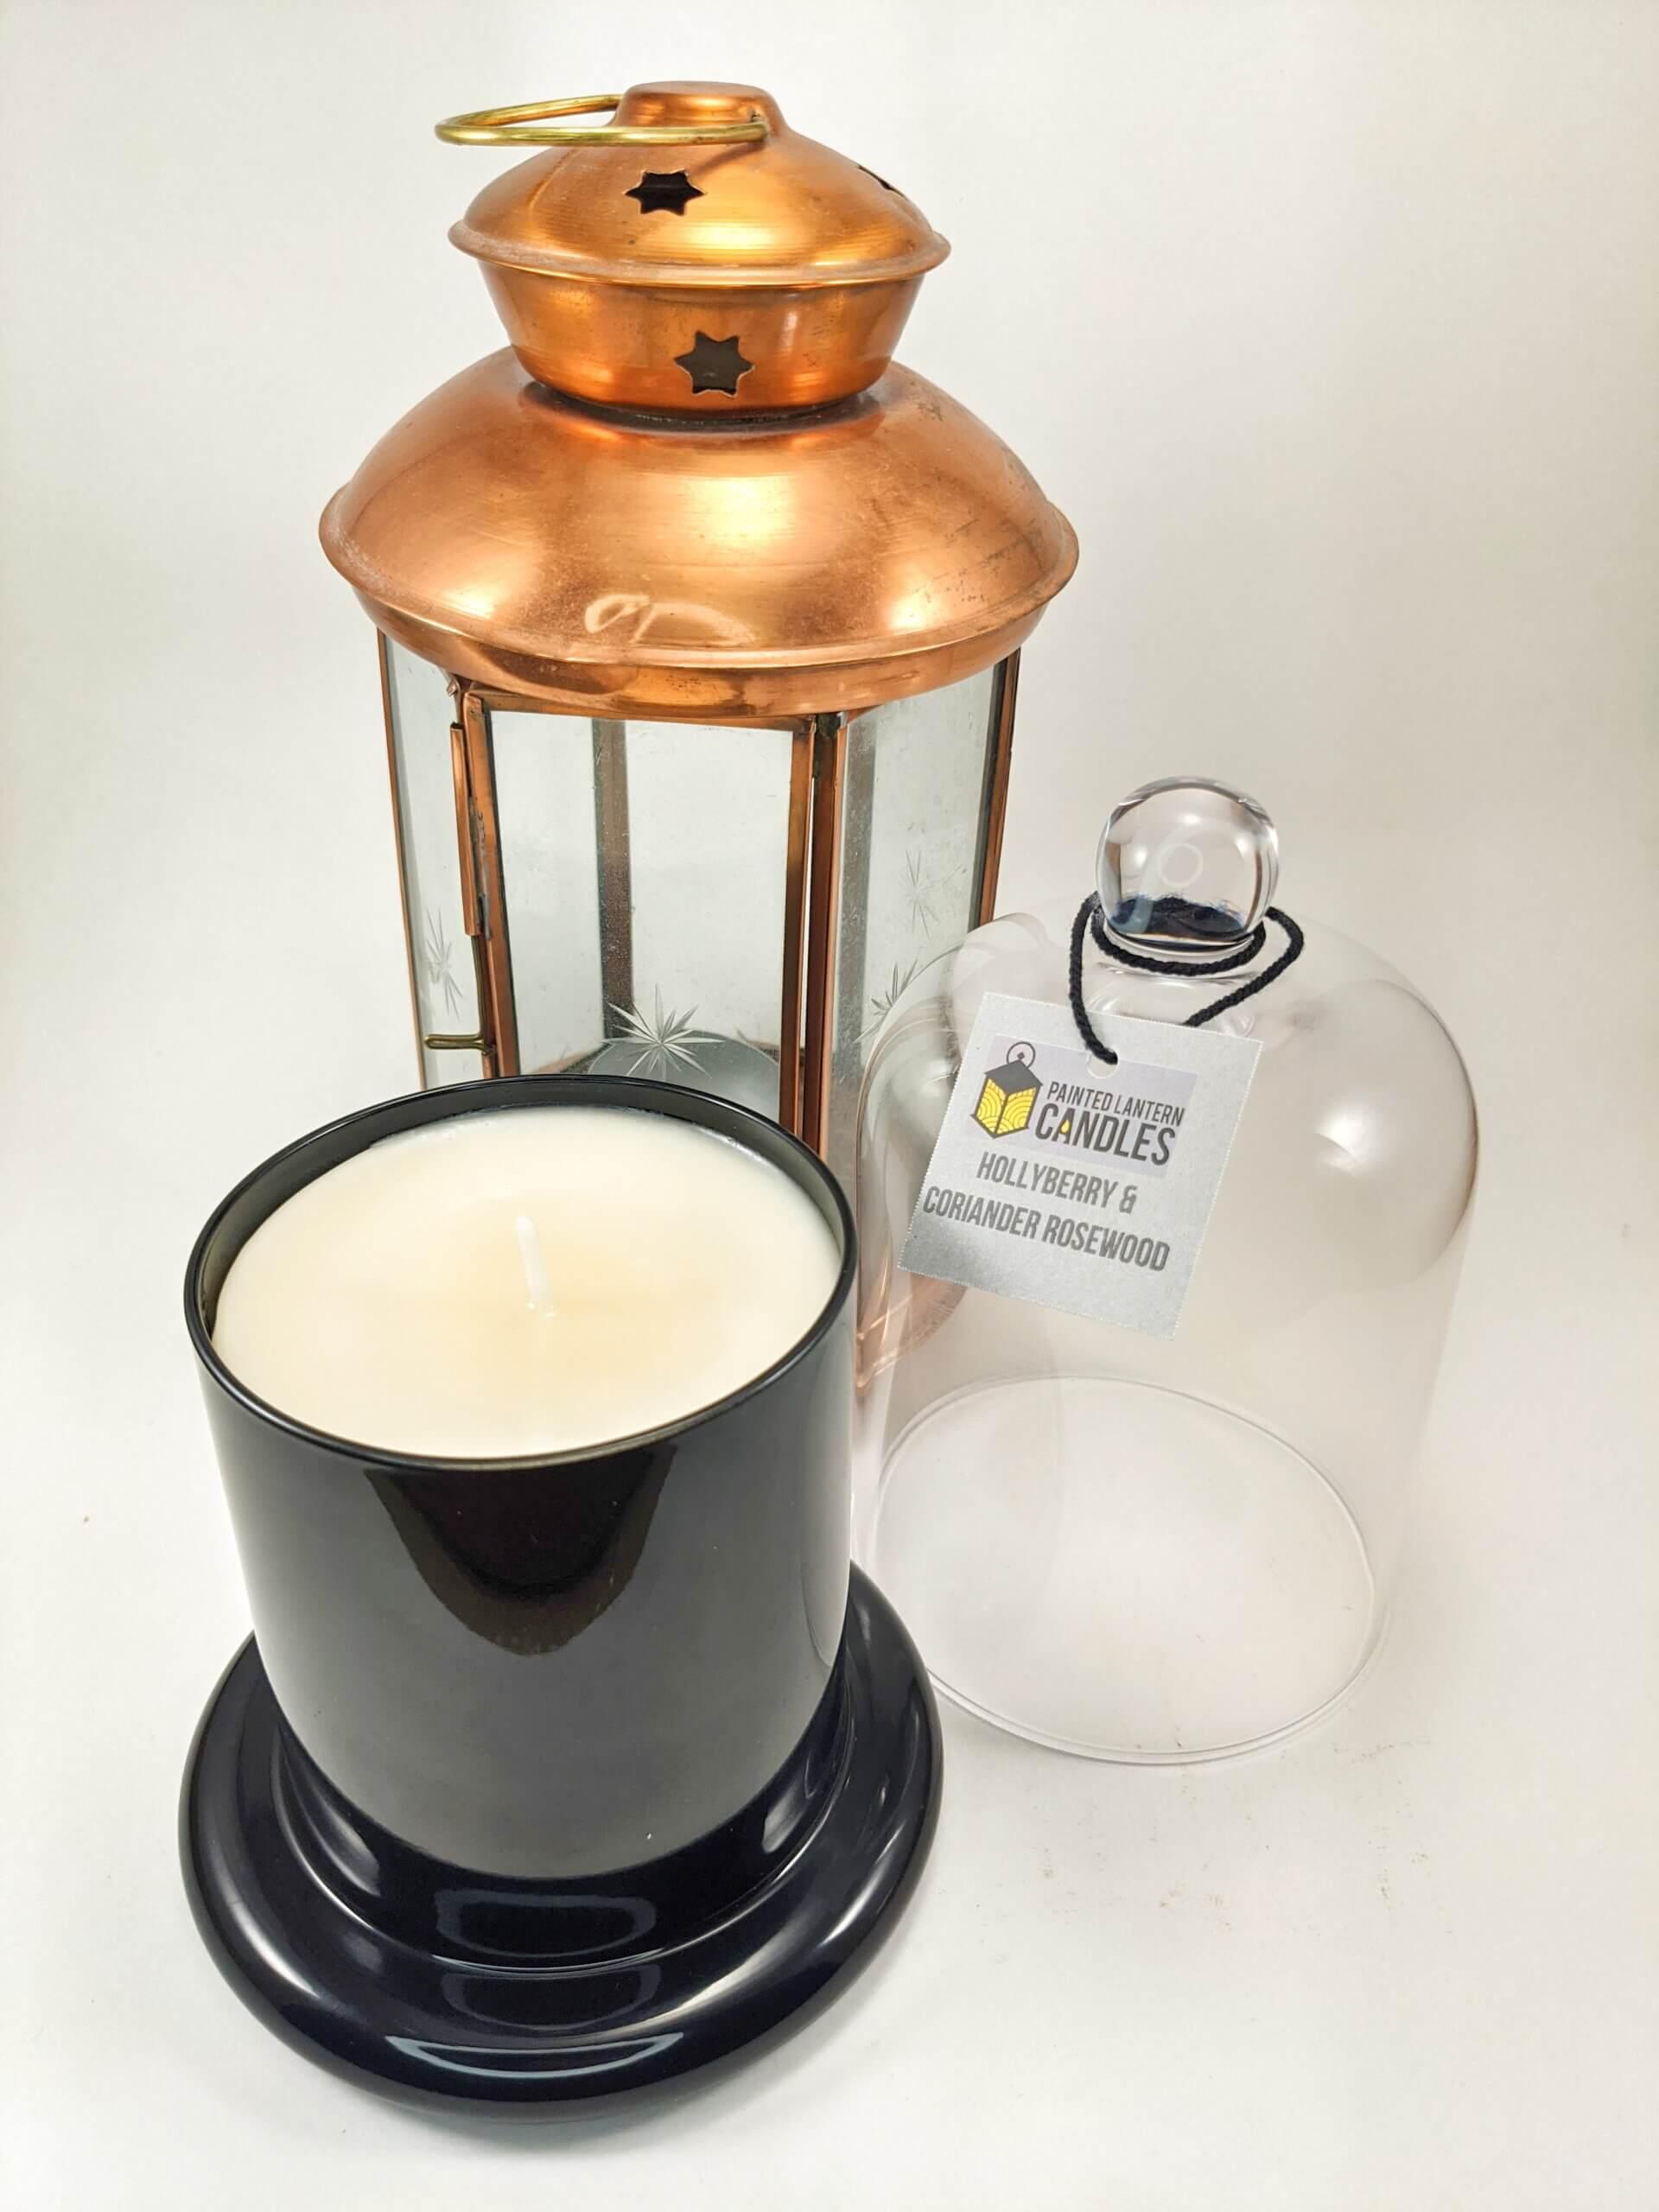 Hollyberry & Coriander Rosewood Bell Jar Portrait